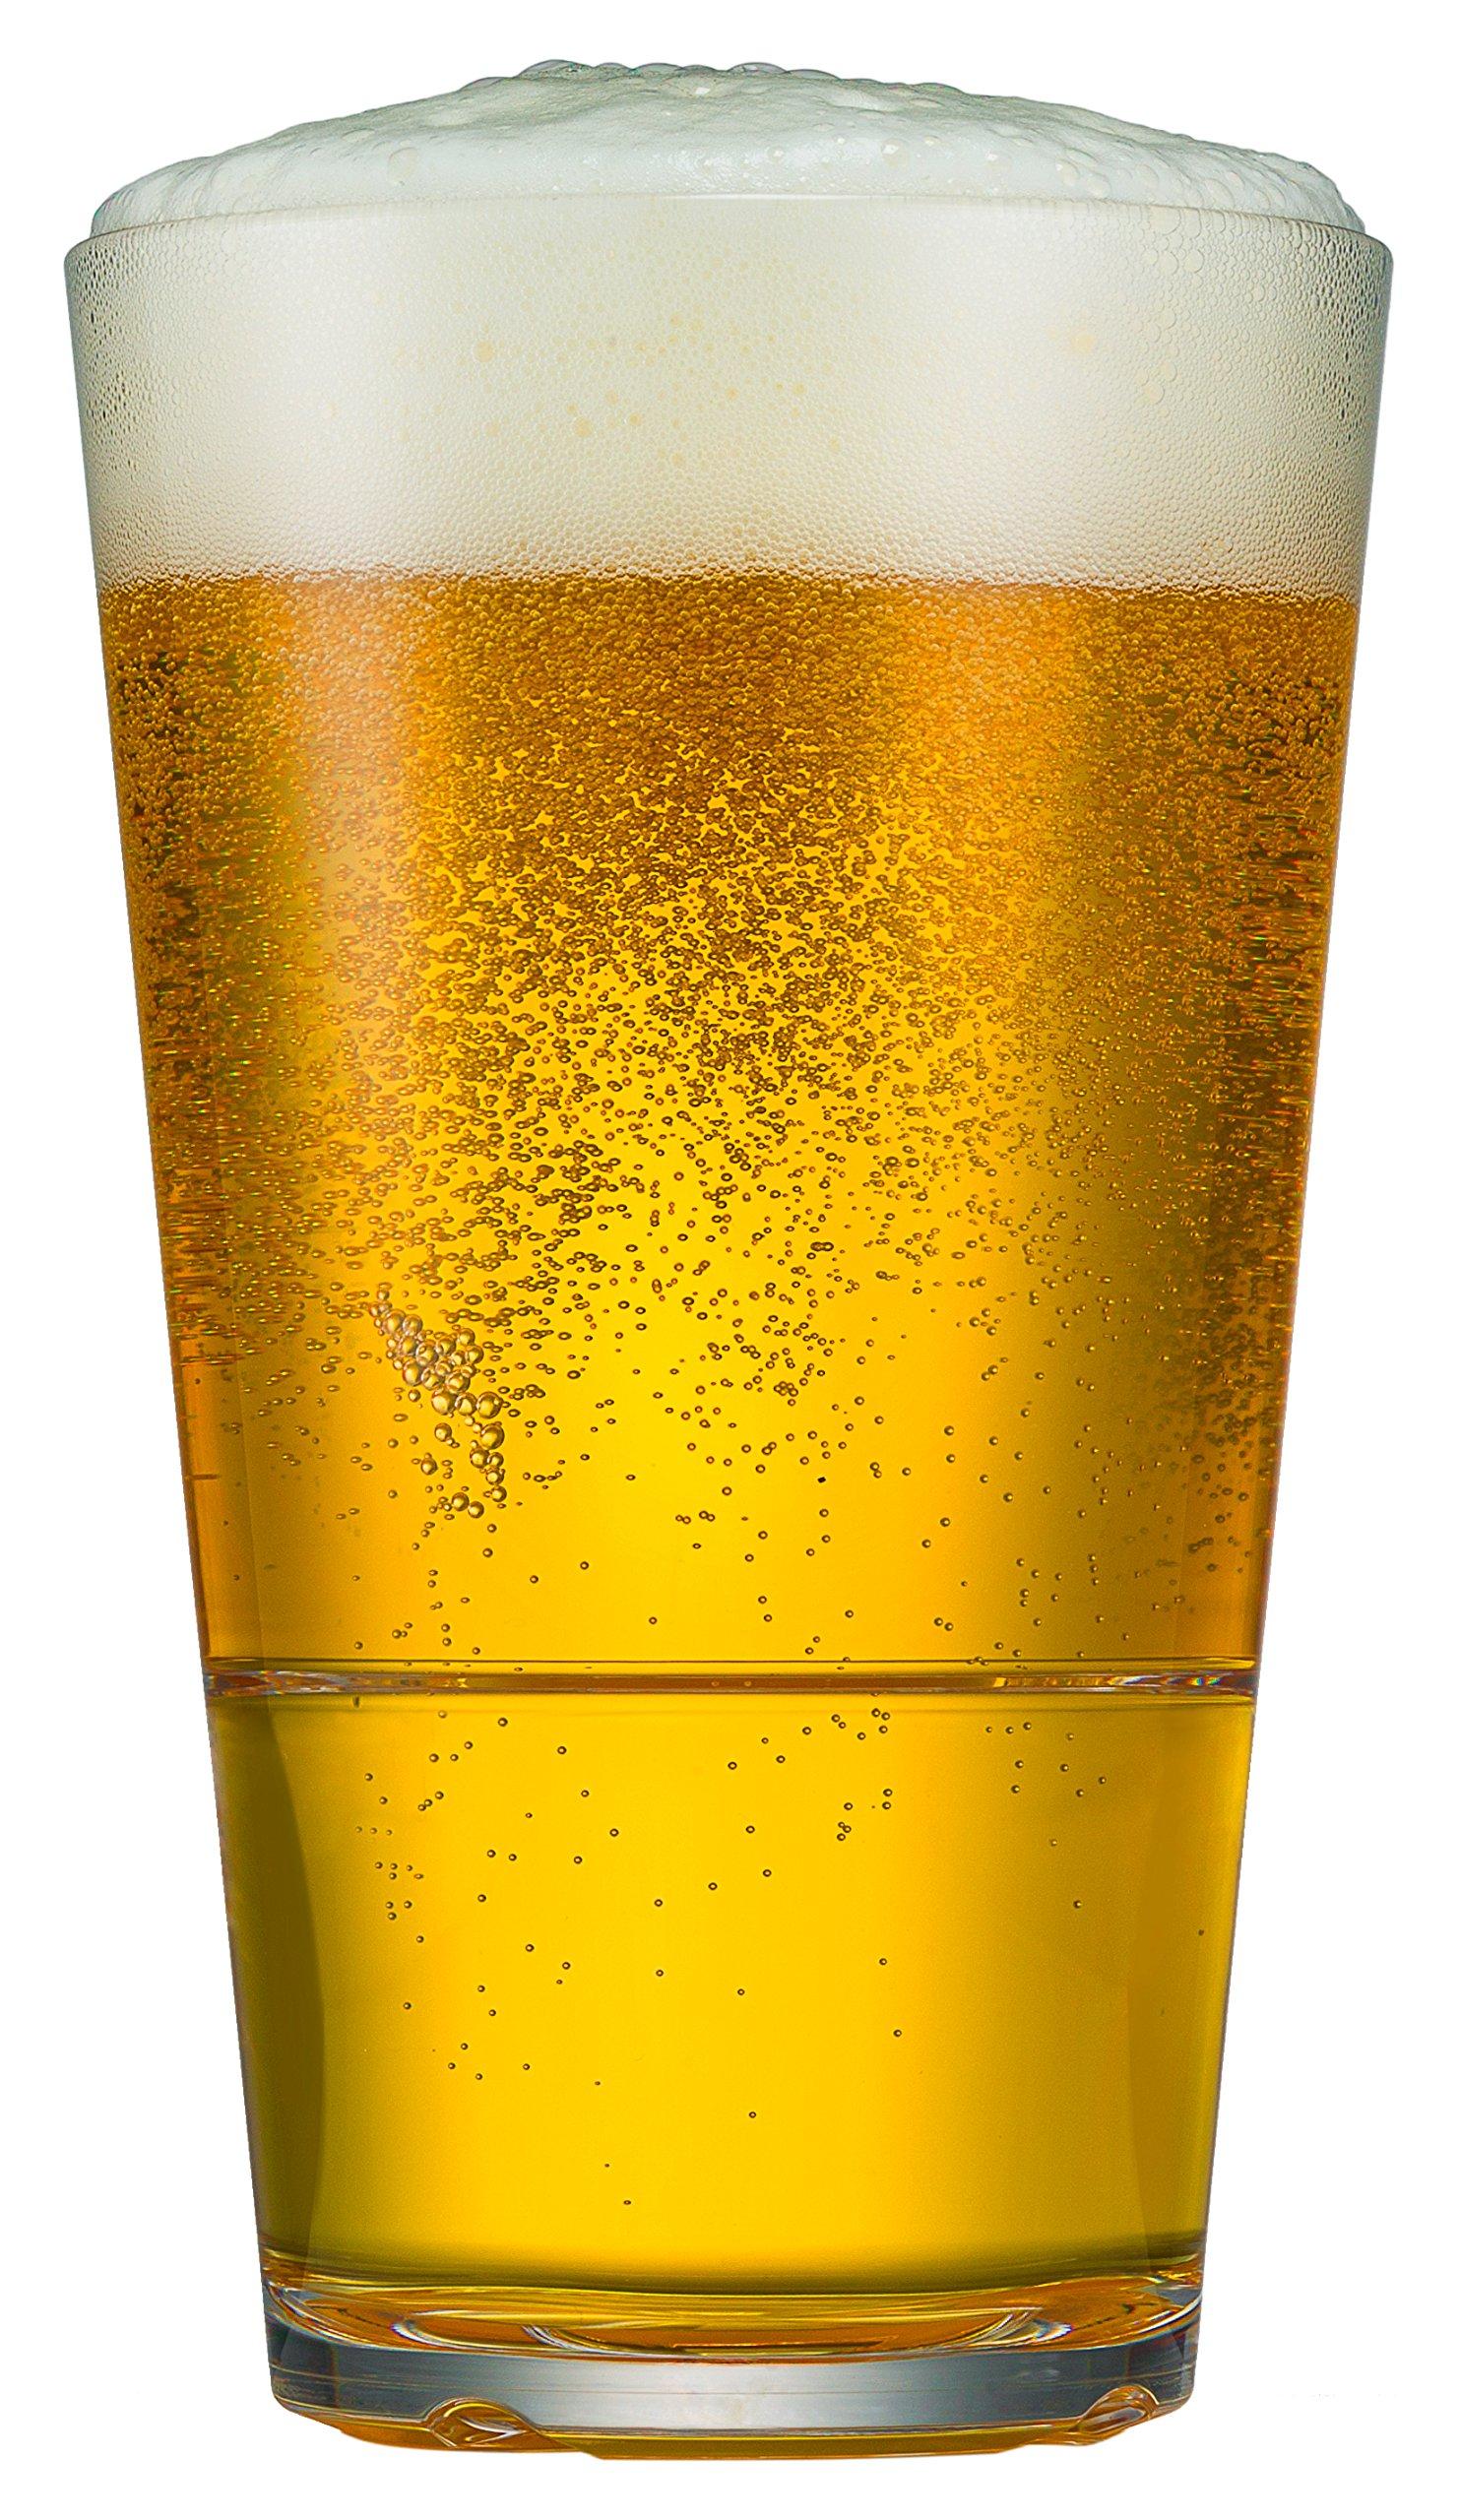 Drinique Caliber Cooler 22 oz. Large Beer Glass - Unbreakable Freezer Safe, BPA-free, Premium Tritan Plastic Tumbler (Case of 24, Clear)